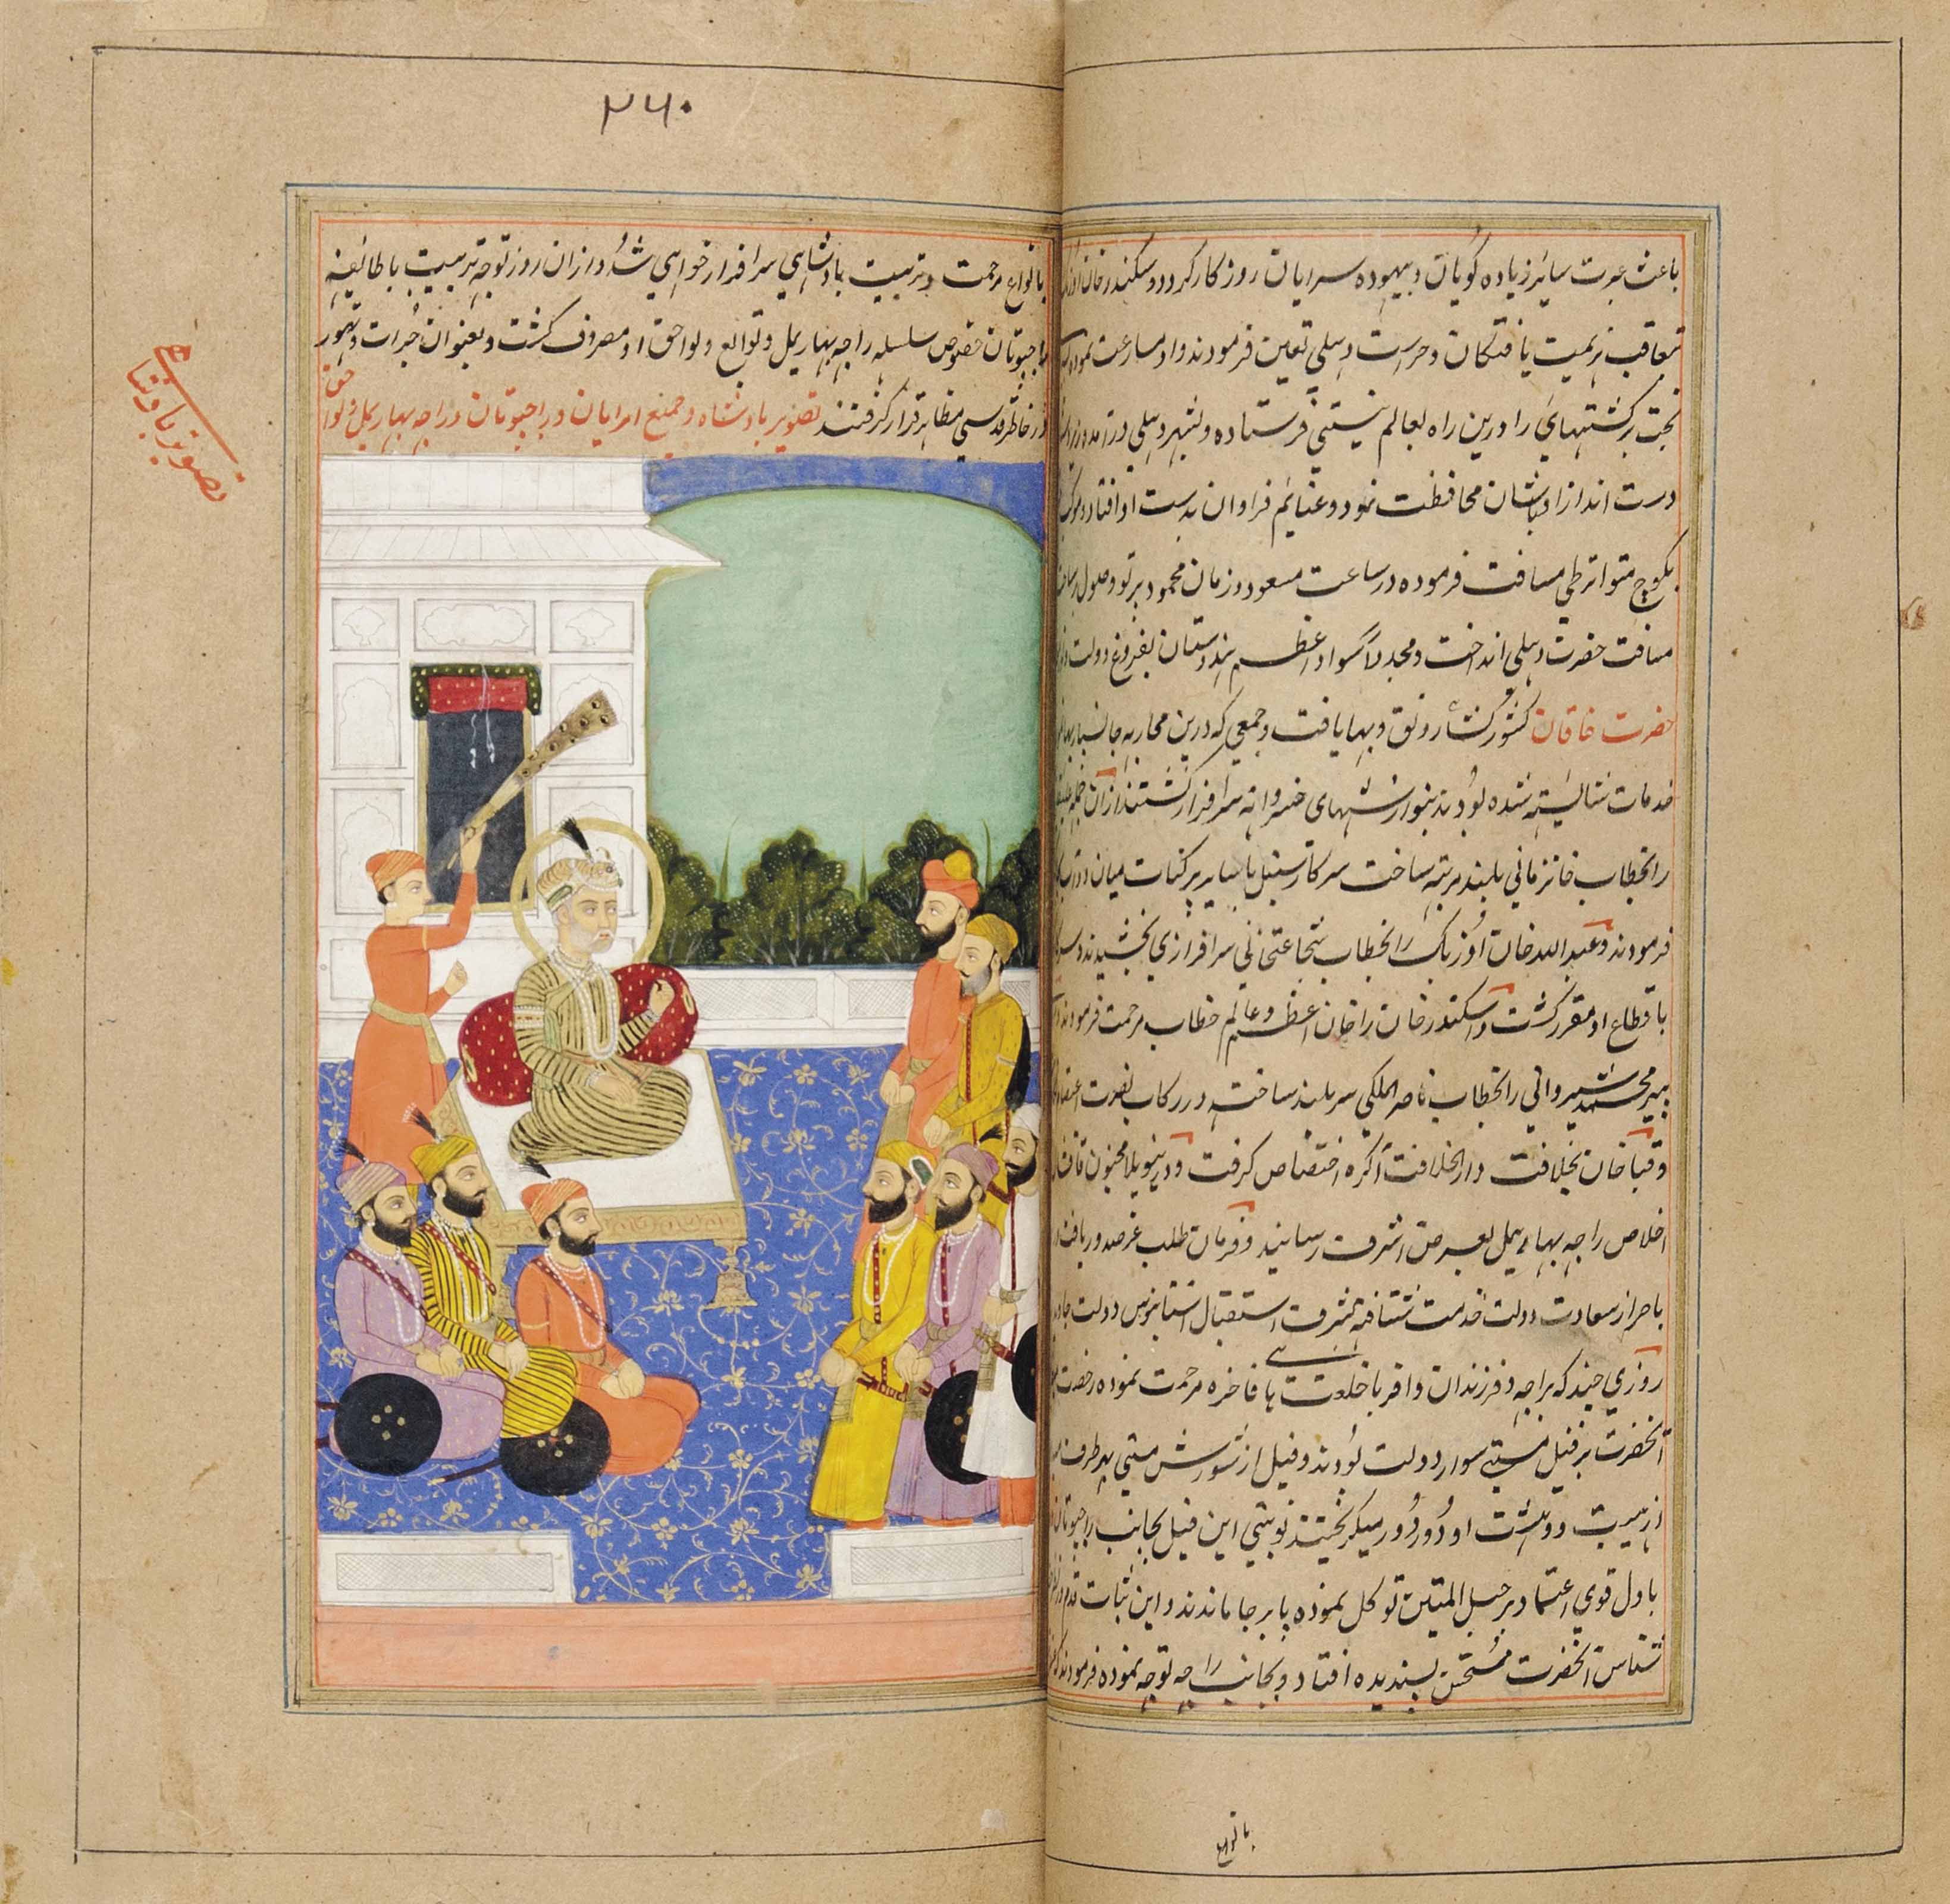 THE MEMOIRS OF EMPEROR JAHANGI